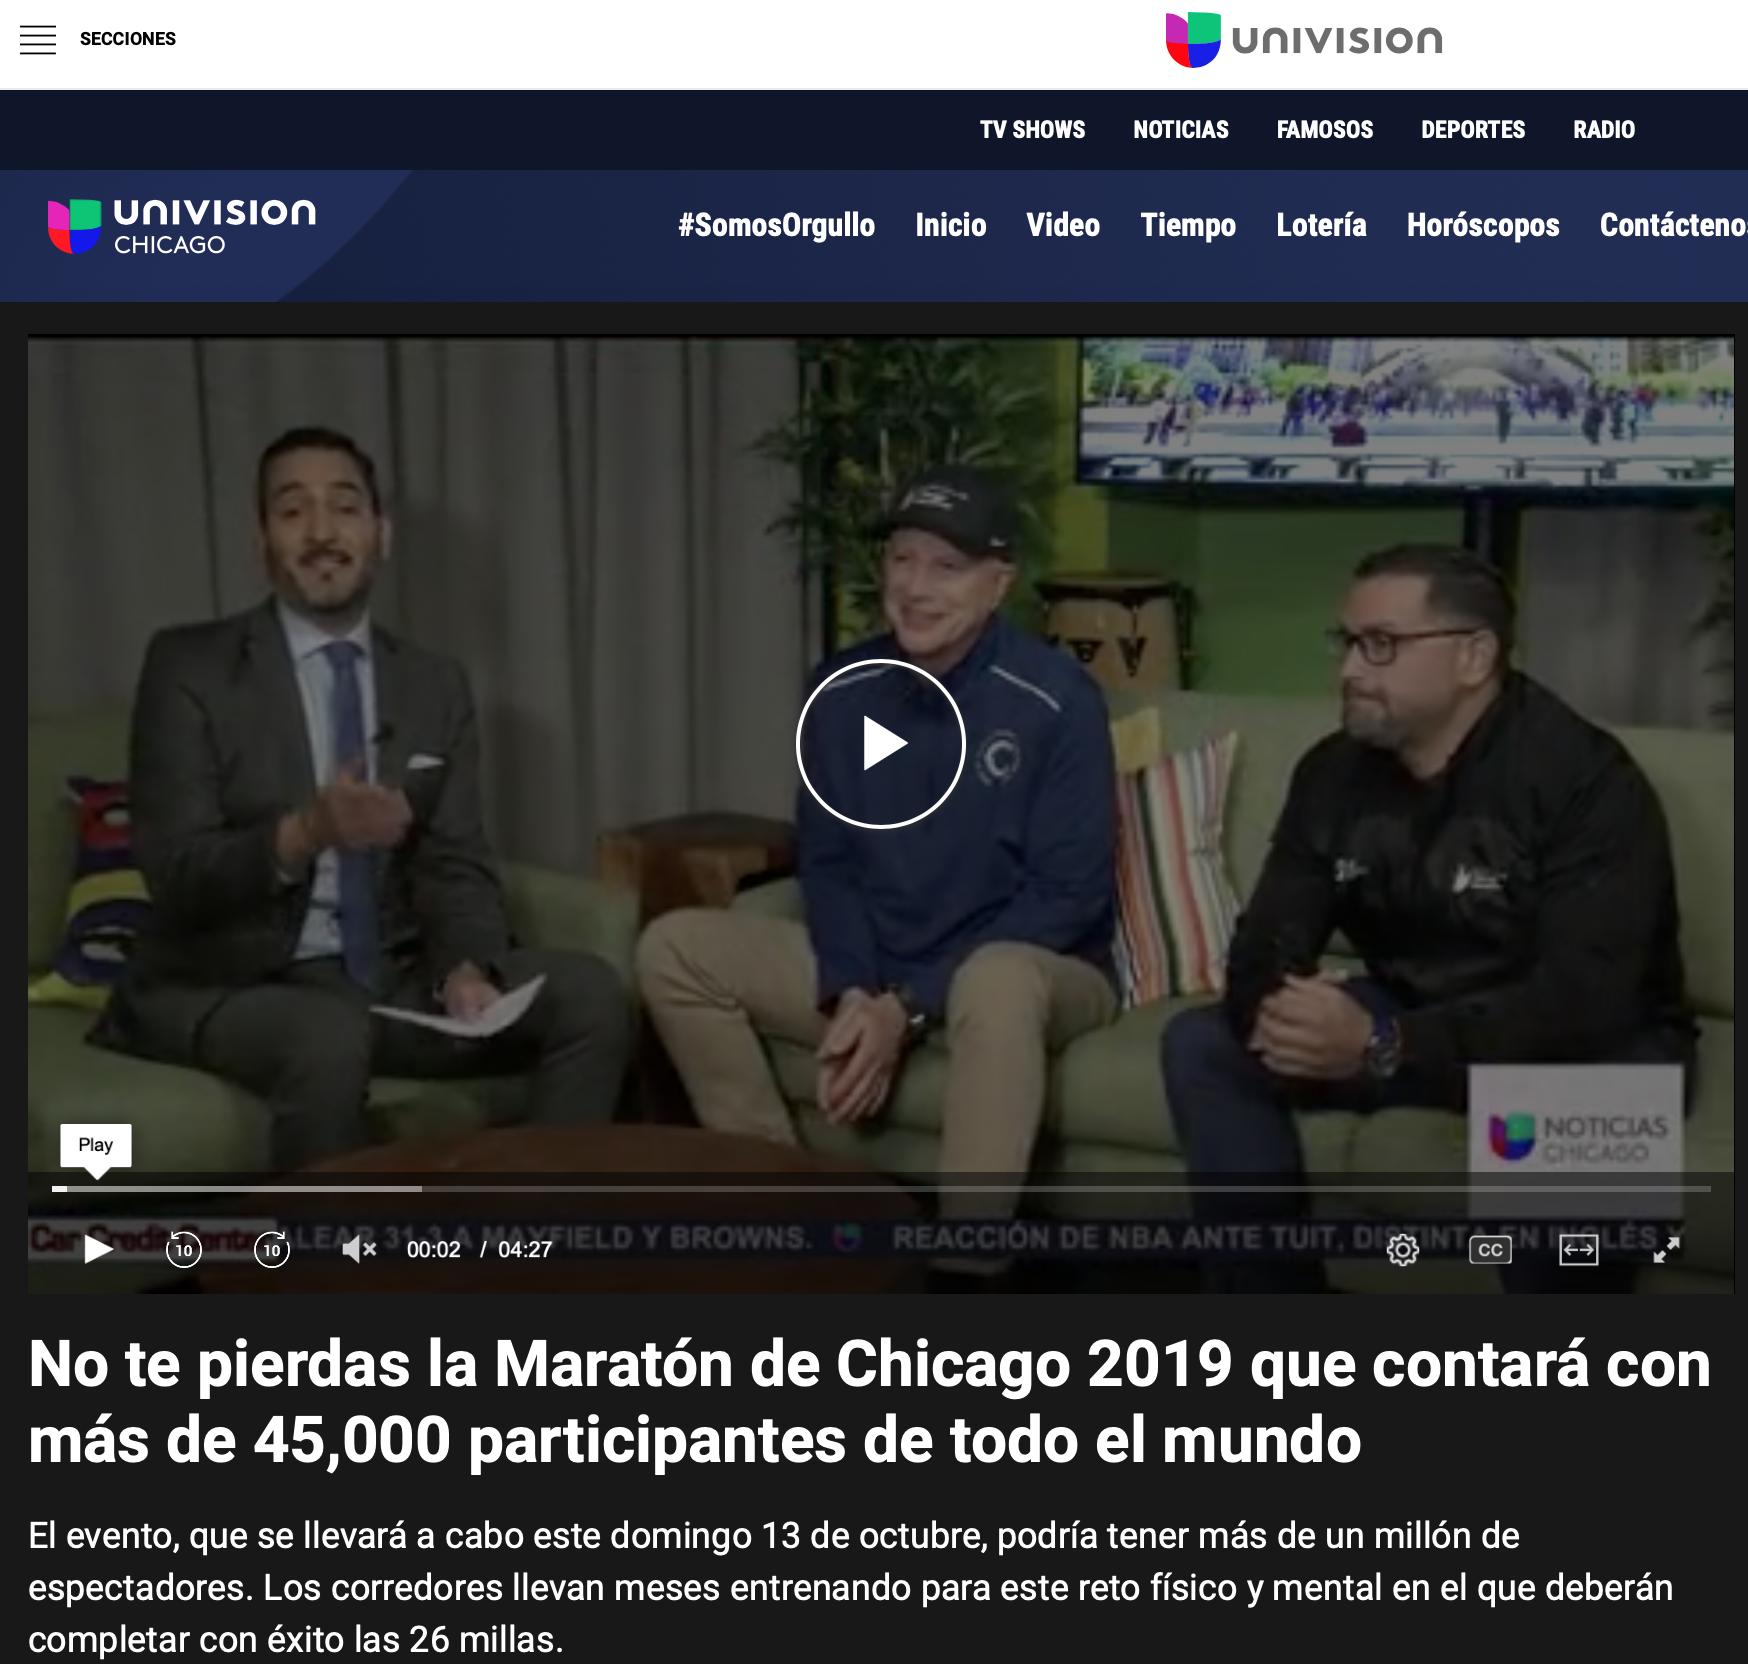 Bank-of-america-chicago-marathon-2019-carey-pinkowski-univision-chicago-Ximena-larkin